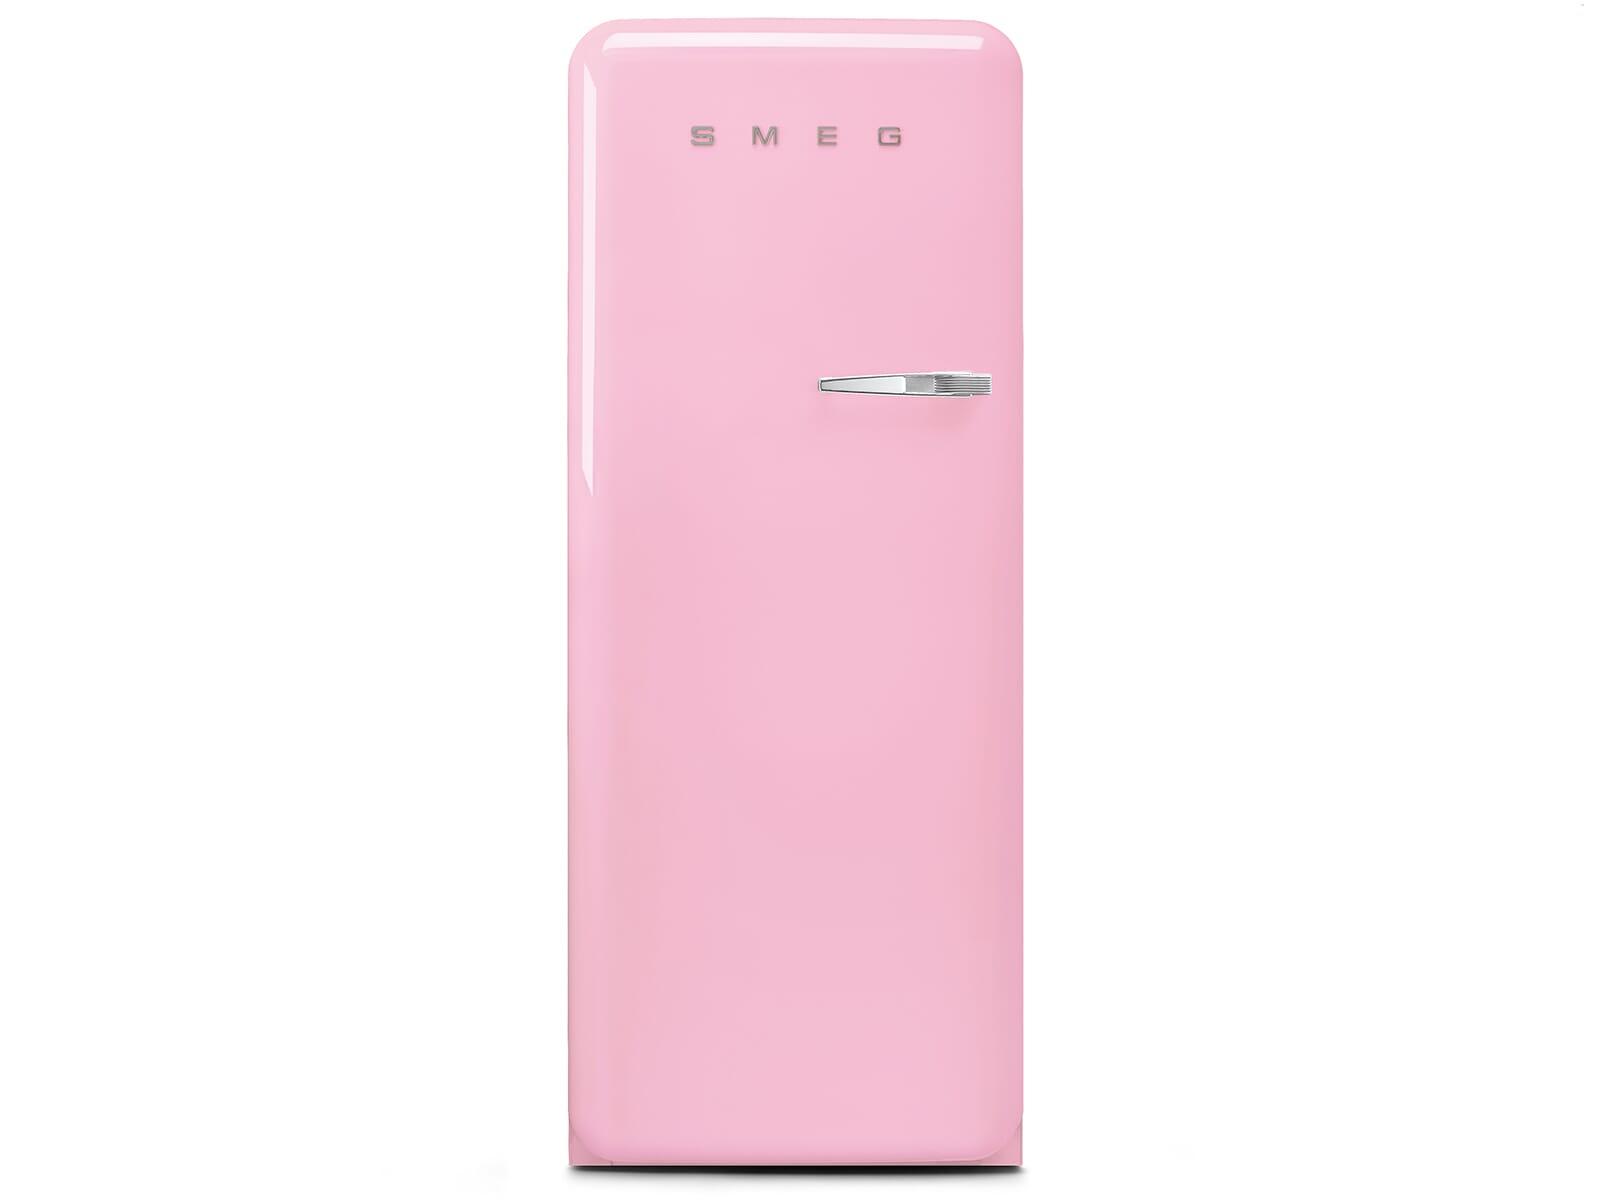 Kühlschrank Pink : Retro kühlschrank pink: smeg retro kühlschrank design fab 28